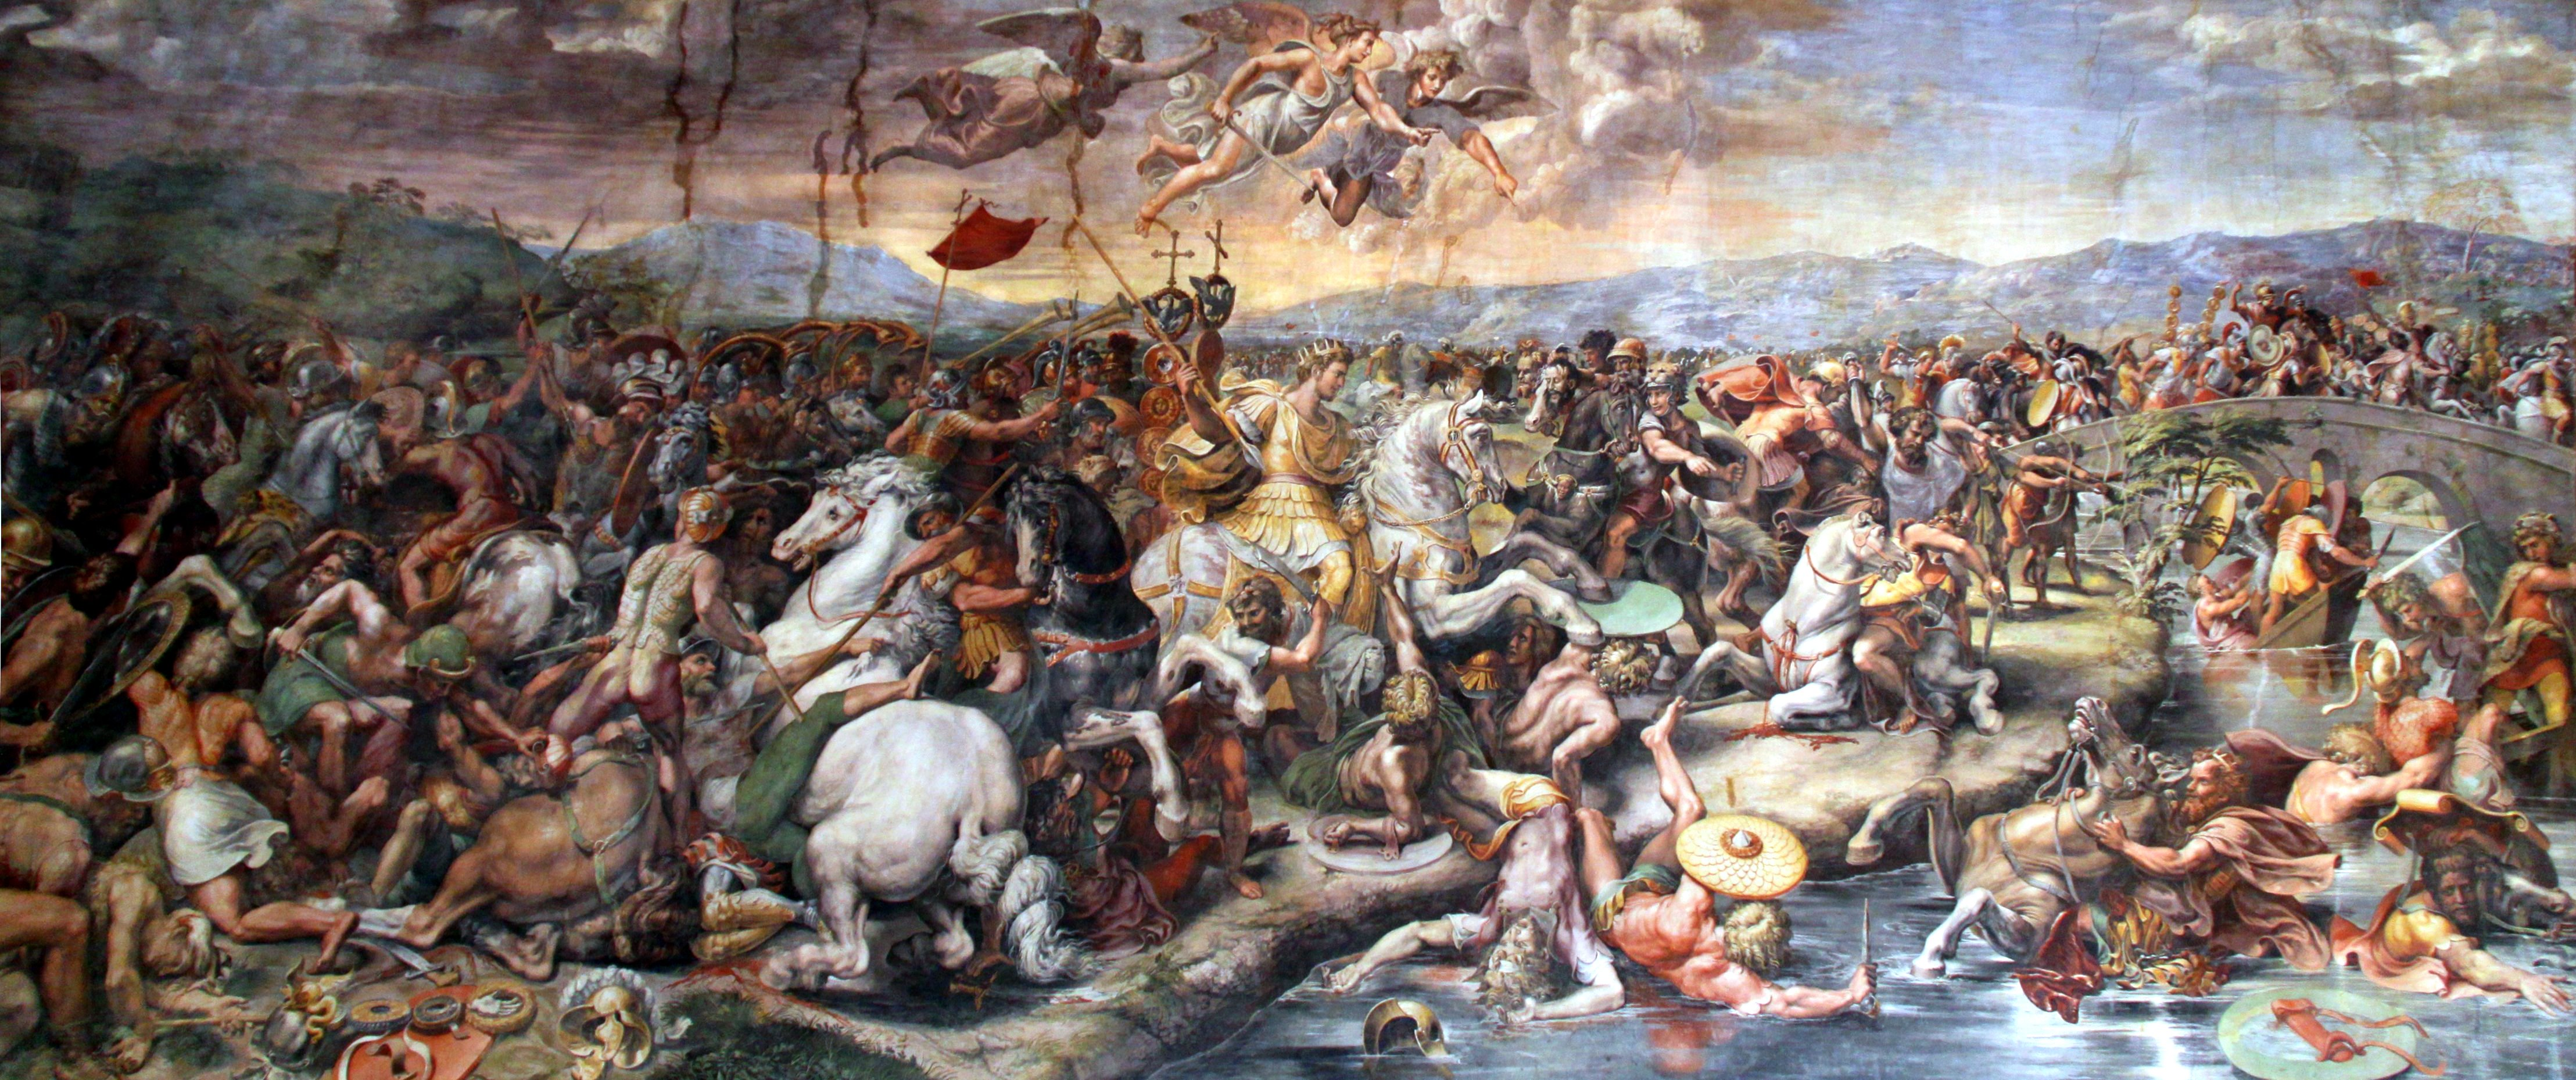 Description Battle of the Milvian Bridge by Giulio Romano, 1520-24.jpg